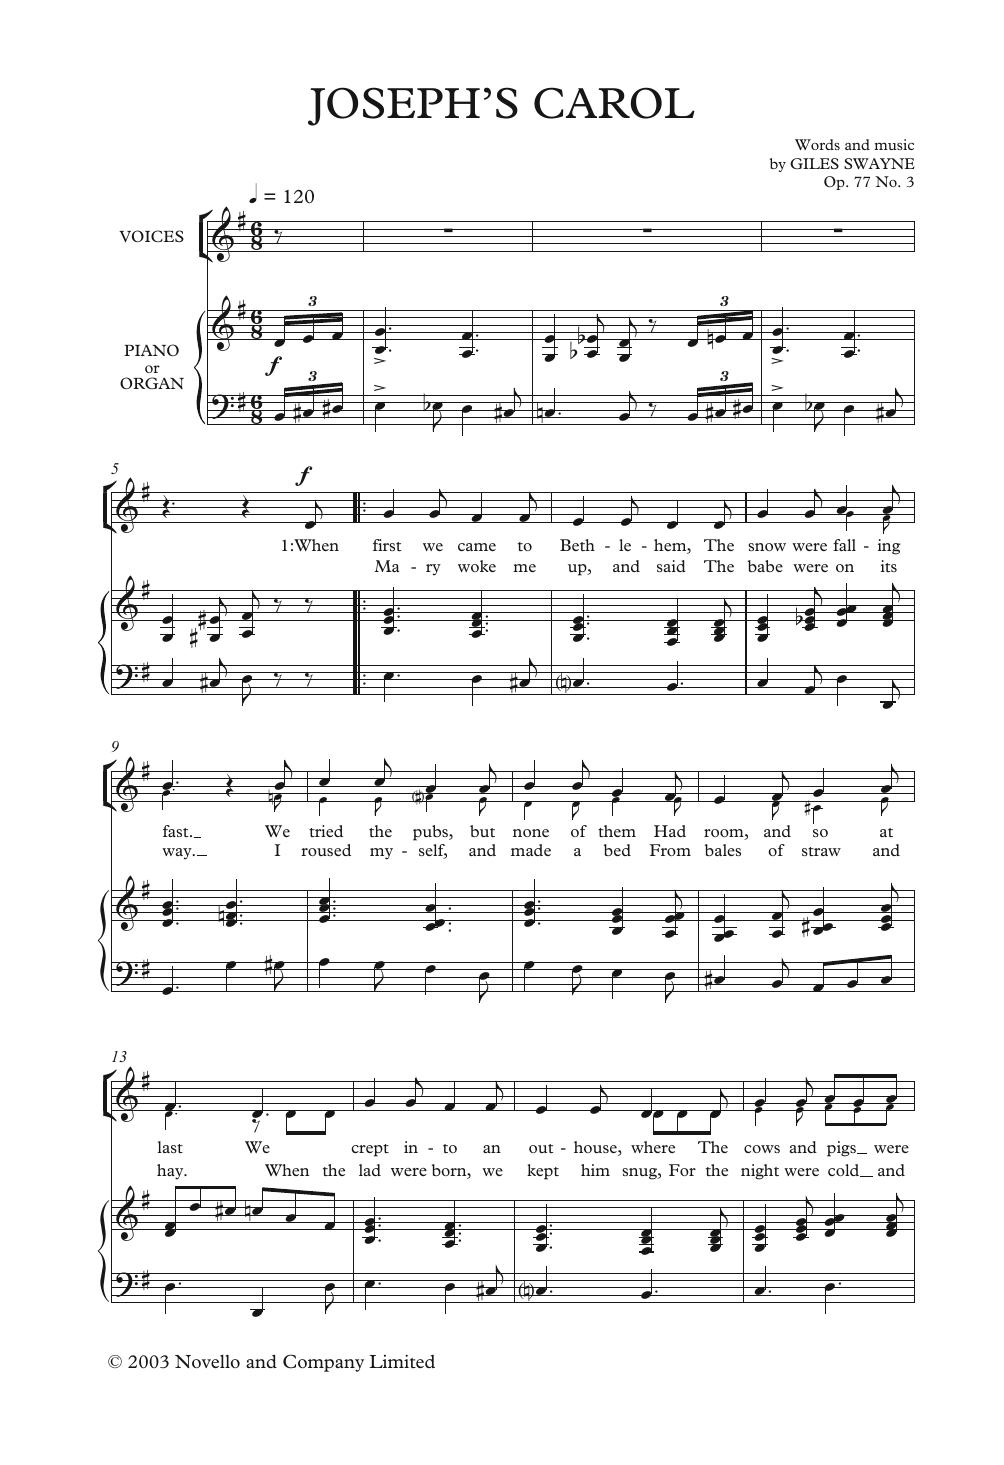 Joseph's Carol Sheet Music